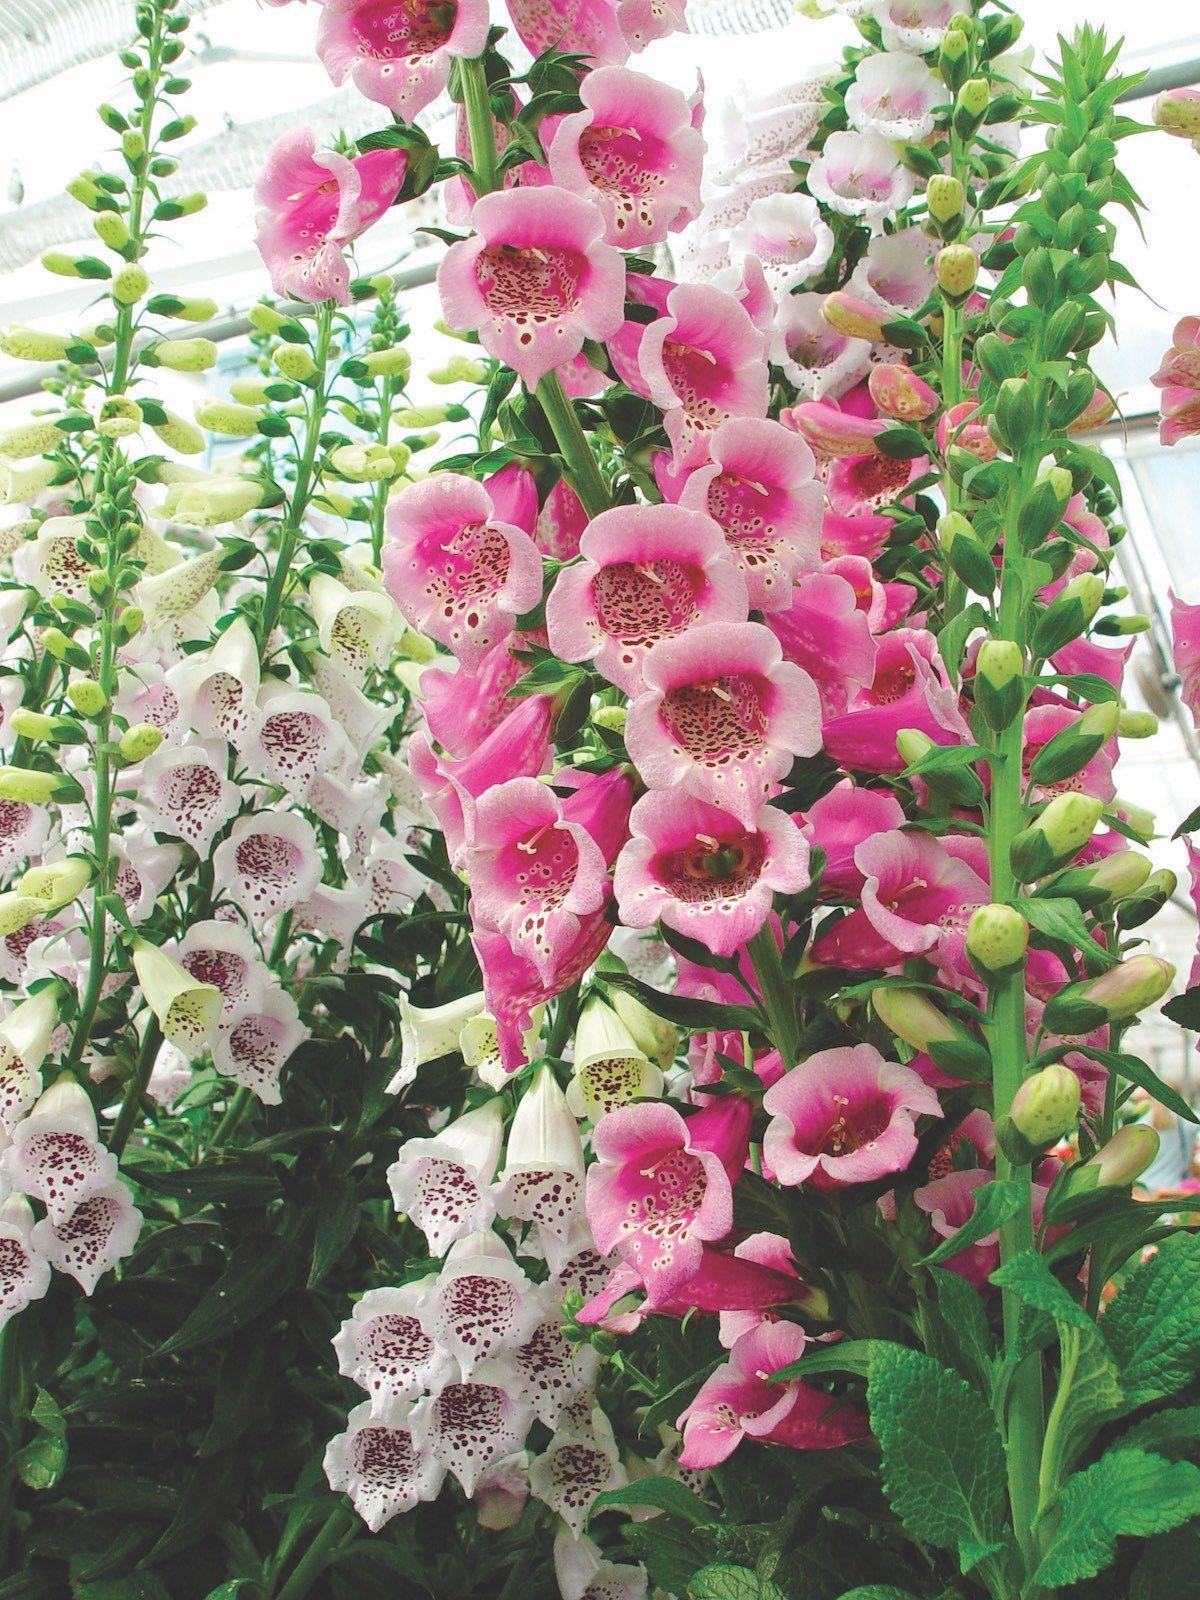 Growing Foxglove Flowers Flower Gardens And Foxglove Plant